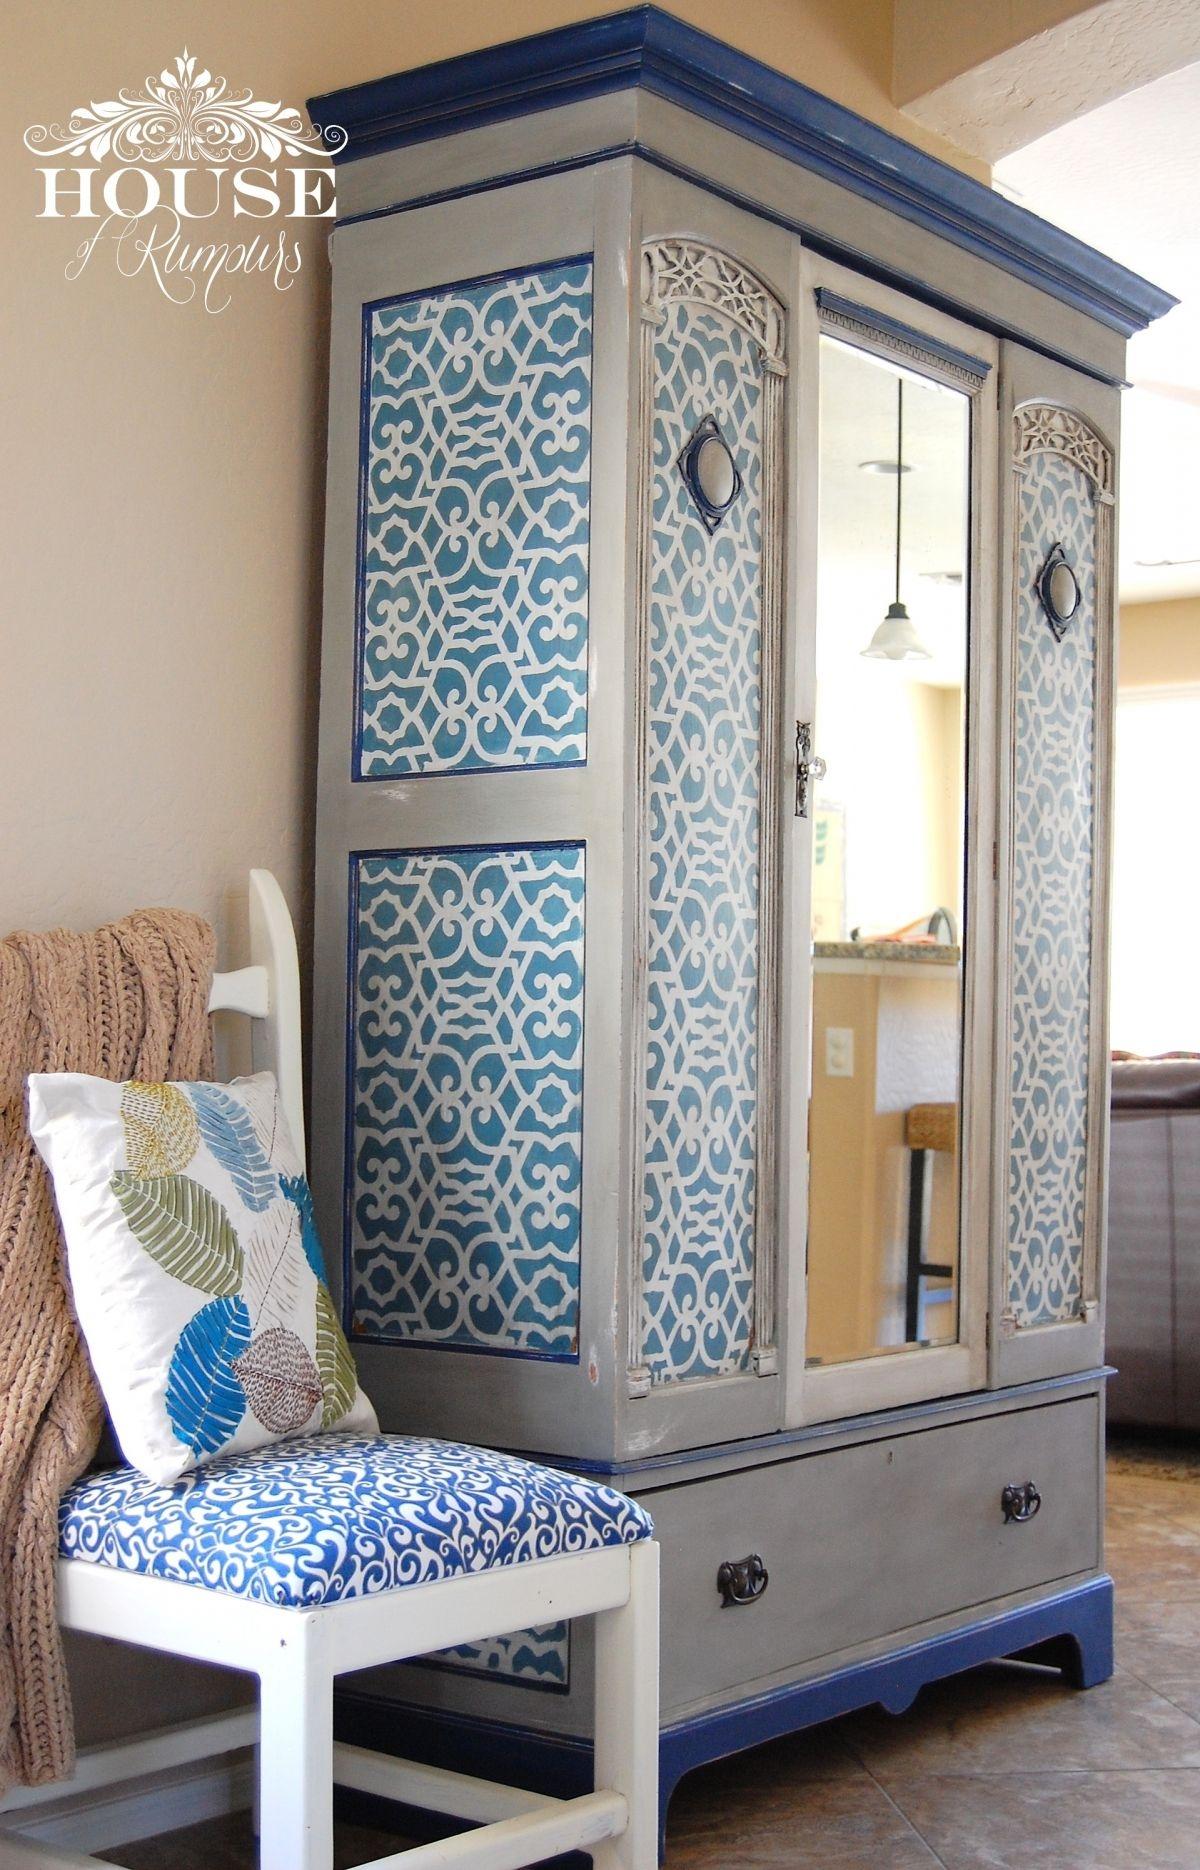 Chez Sheik Moroccan Furniture Stencils For Diy Painted Furniture Royal